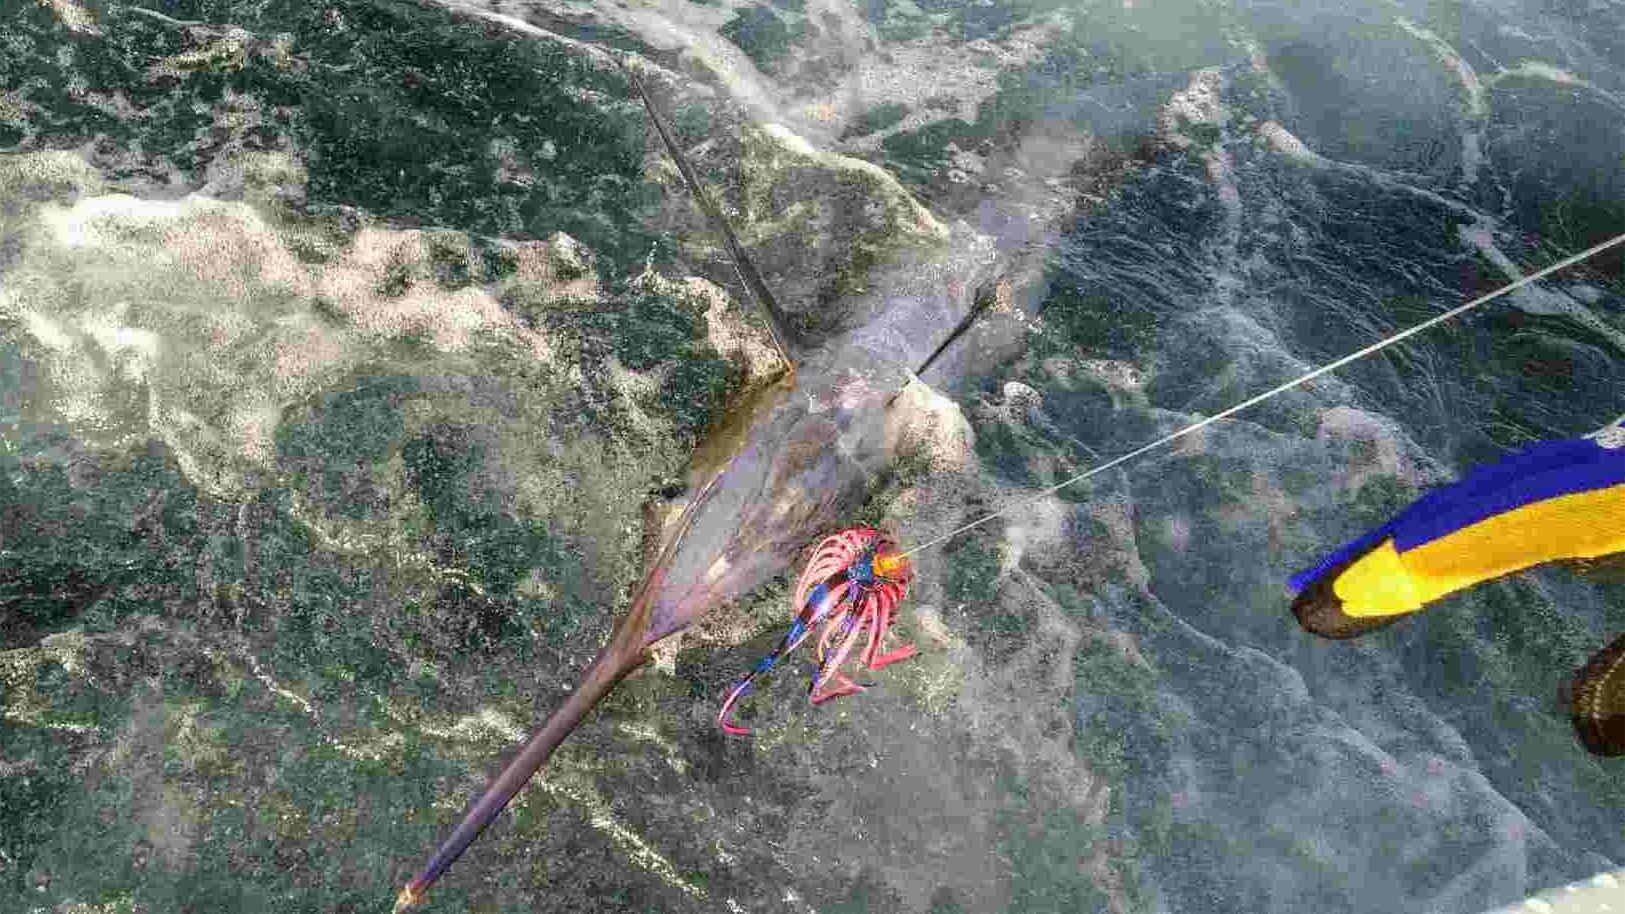 Fishing Charter: Landing a Sailfish